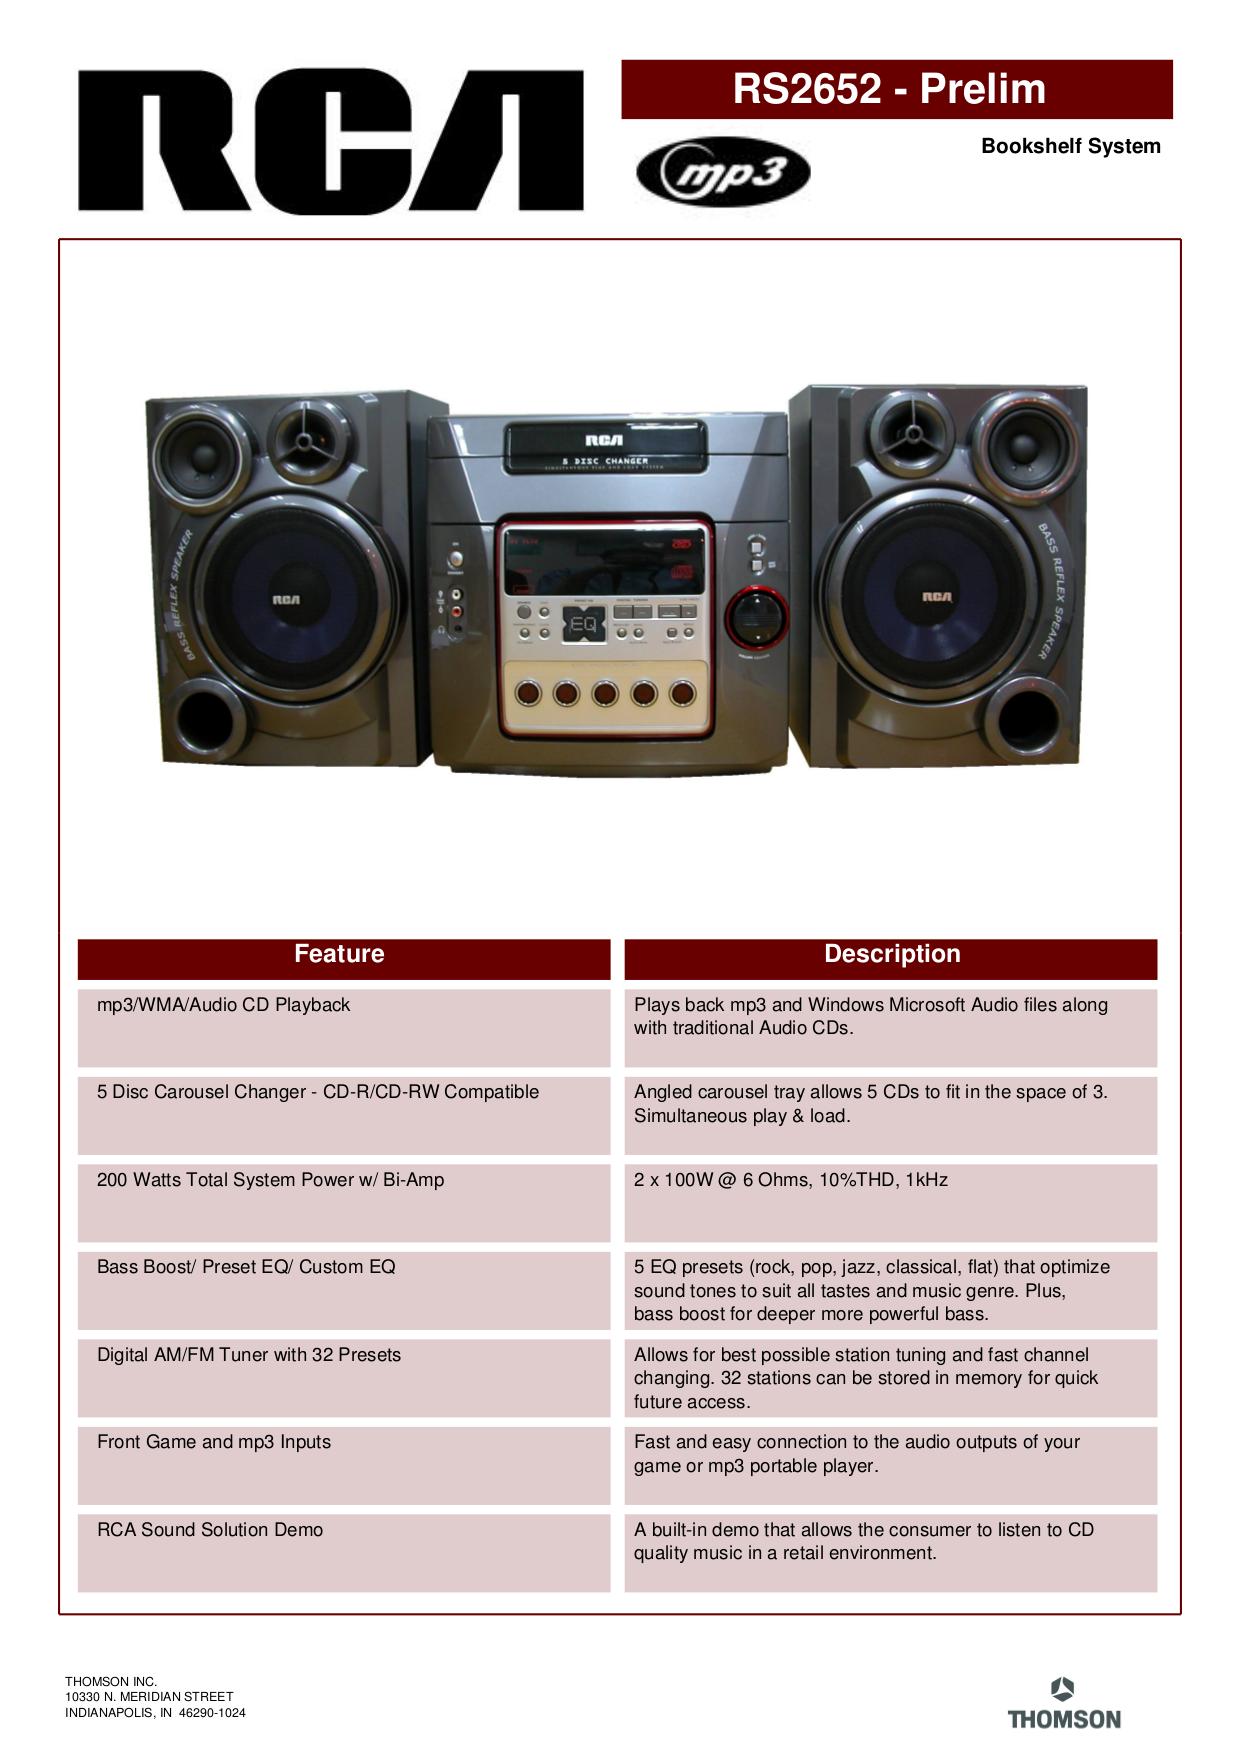 Rca Universal Gemstar Guide Plus Remote Manual